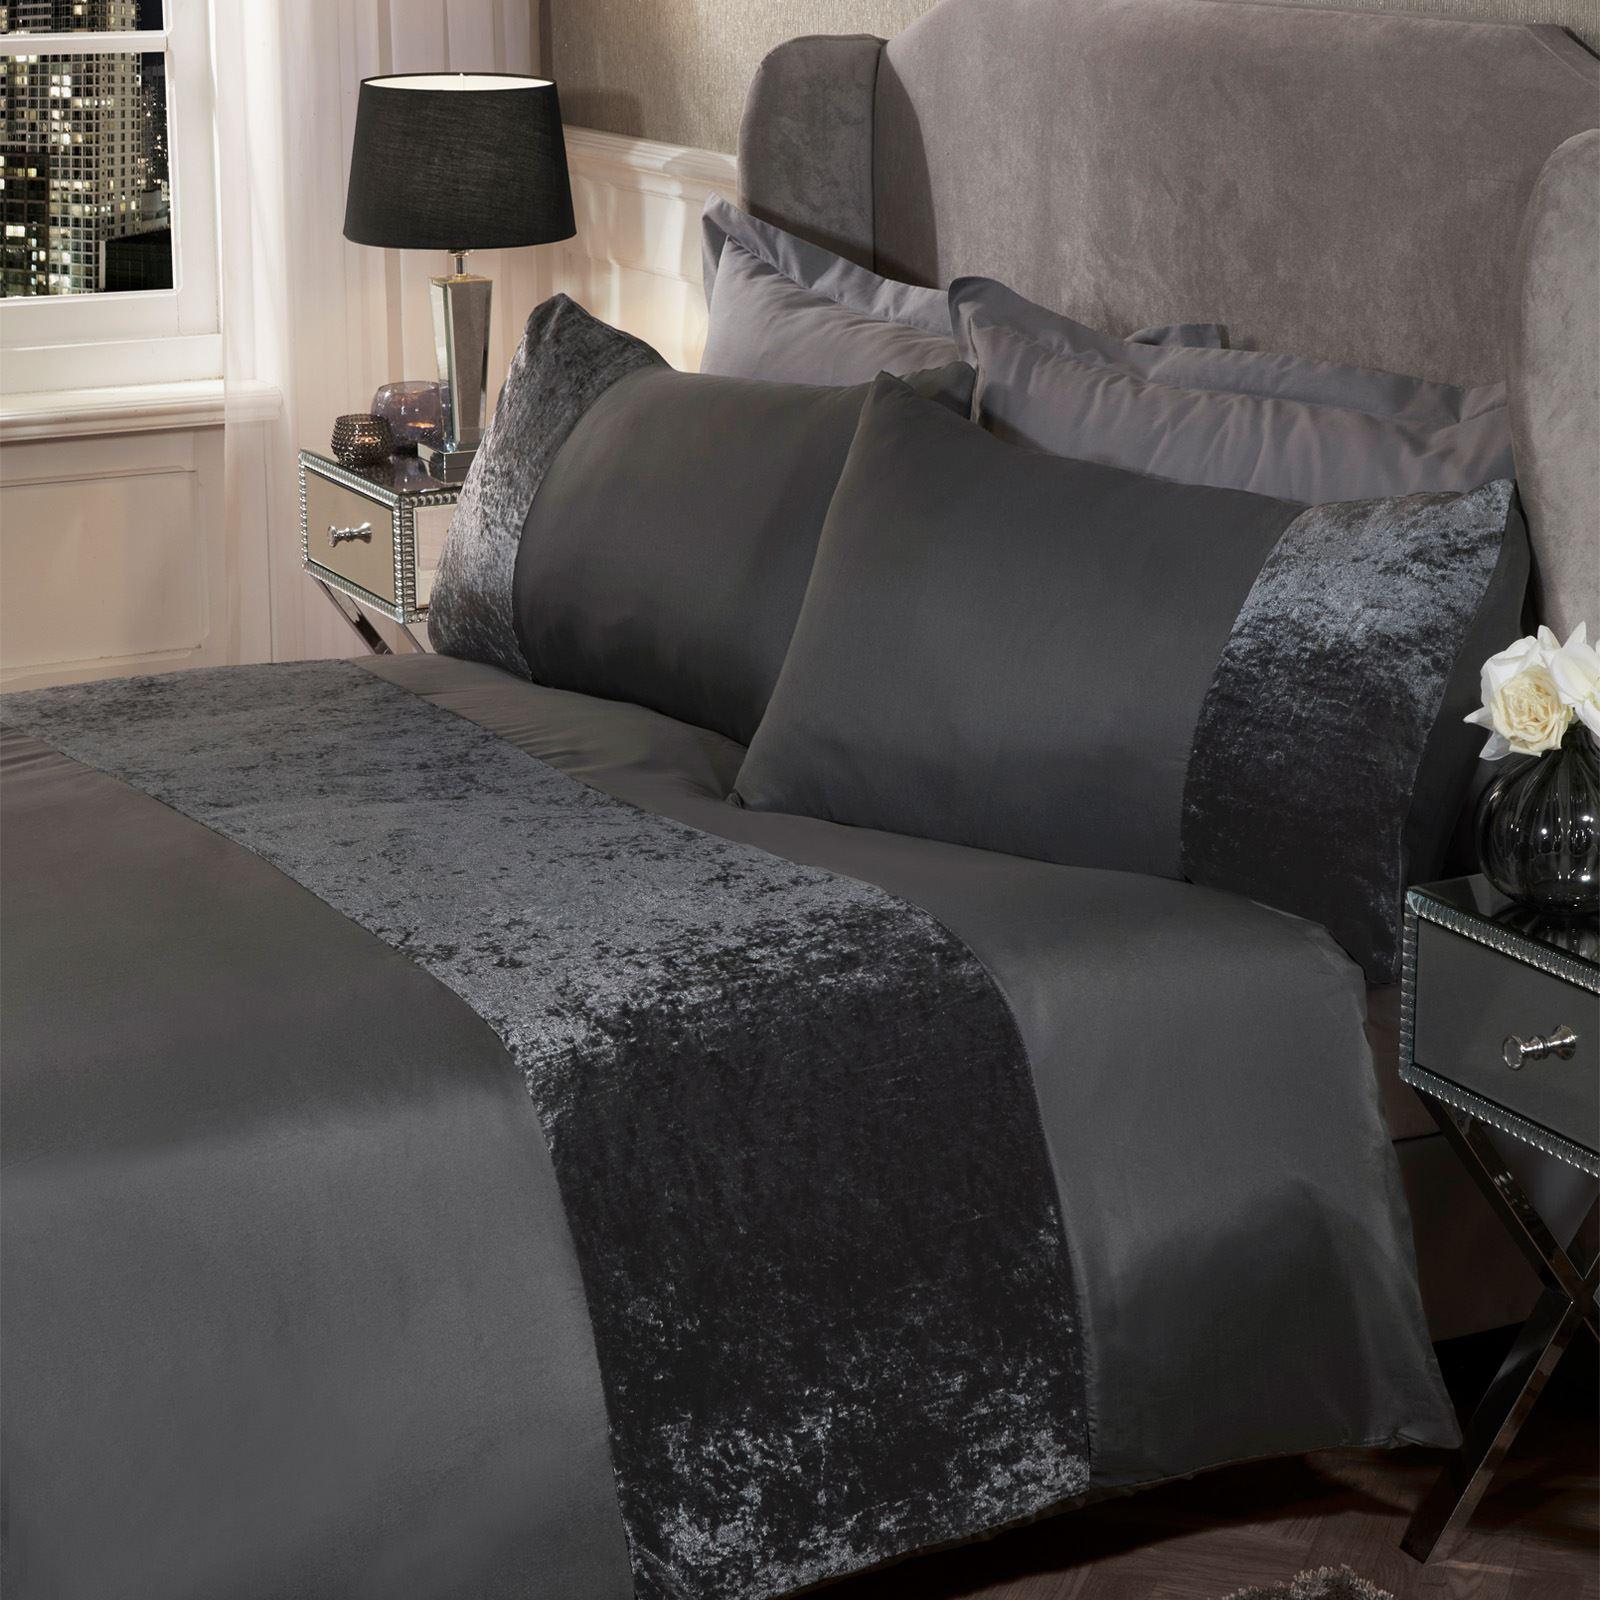 thumbnail 17 - Sienna Crushed Velvet Panel Duvet Cover with Pillow Case Bedding Set Silver Grey